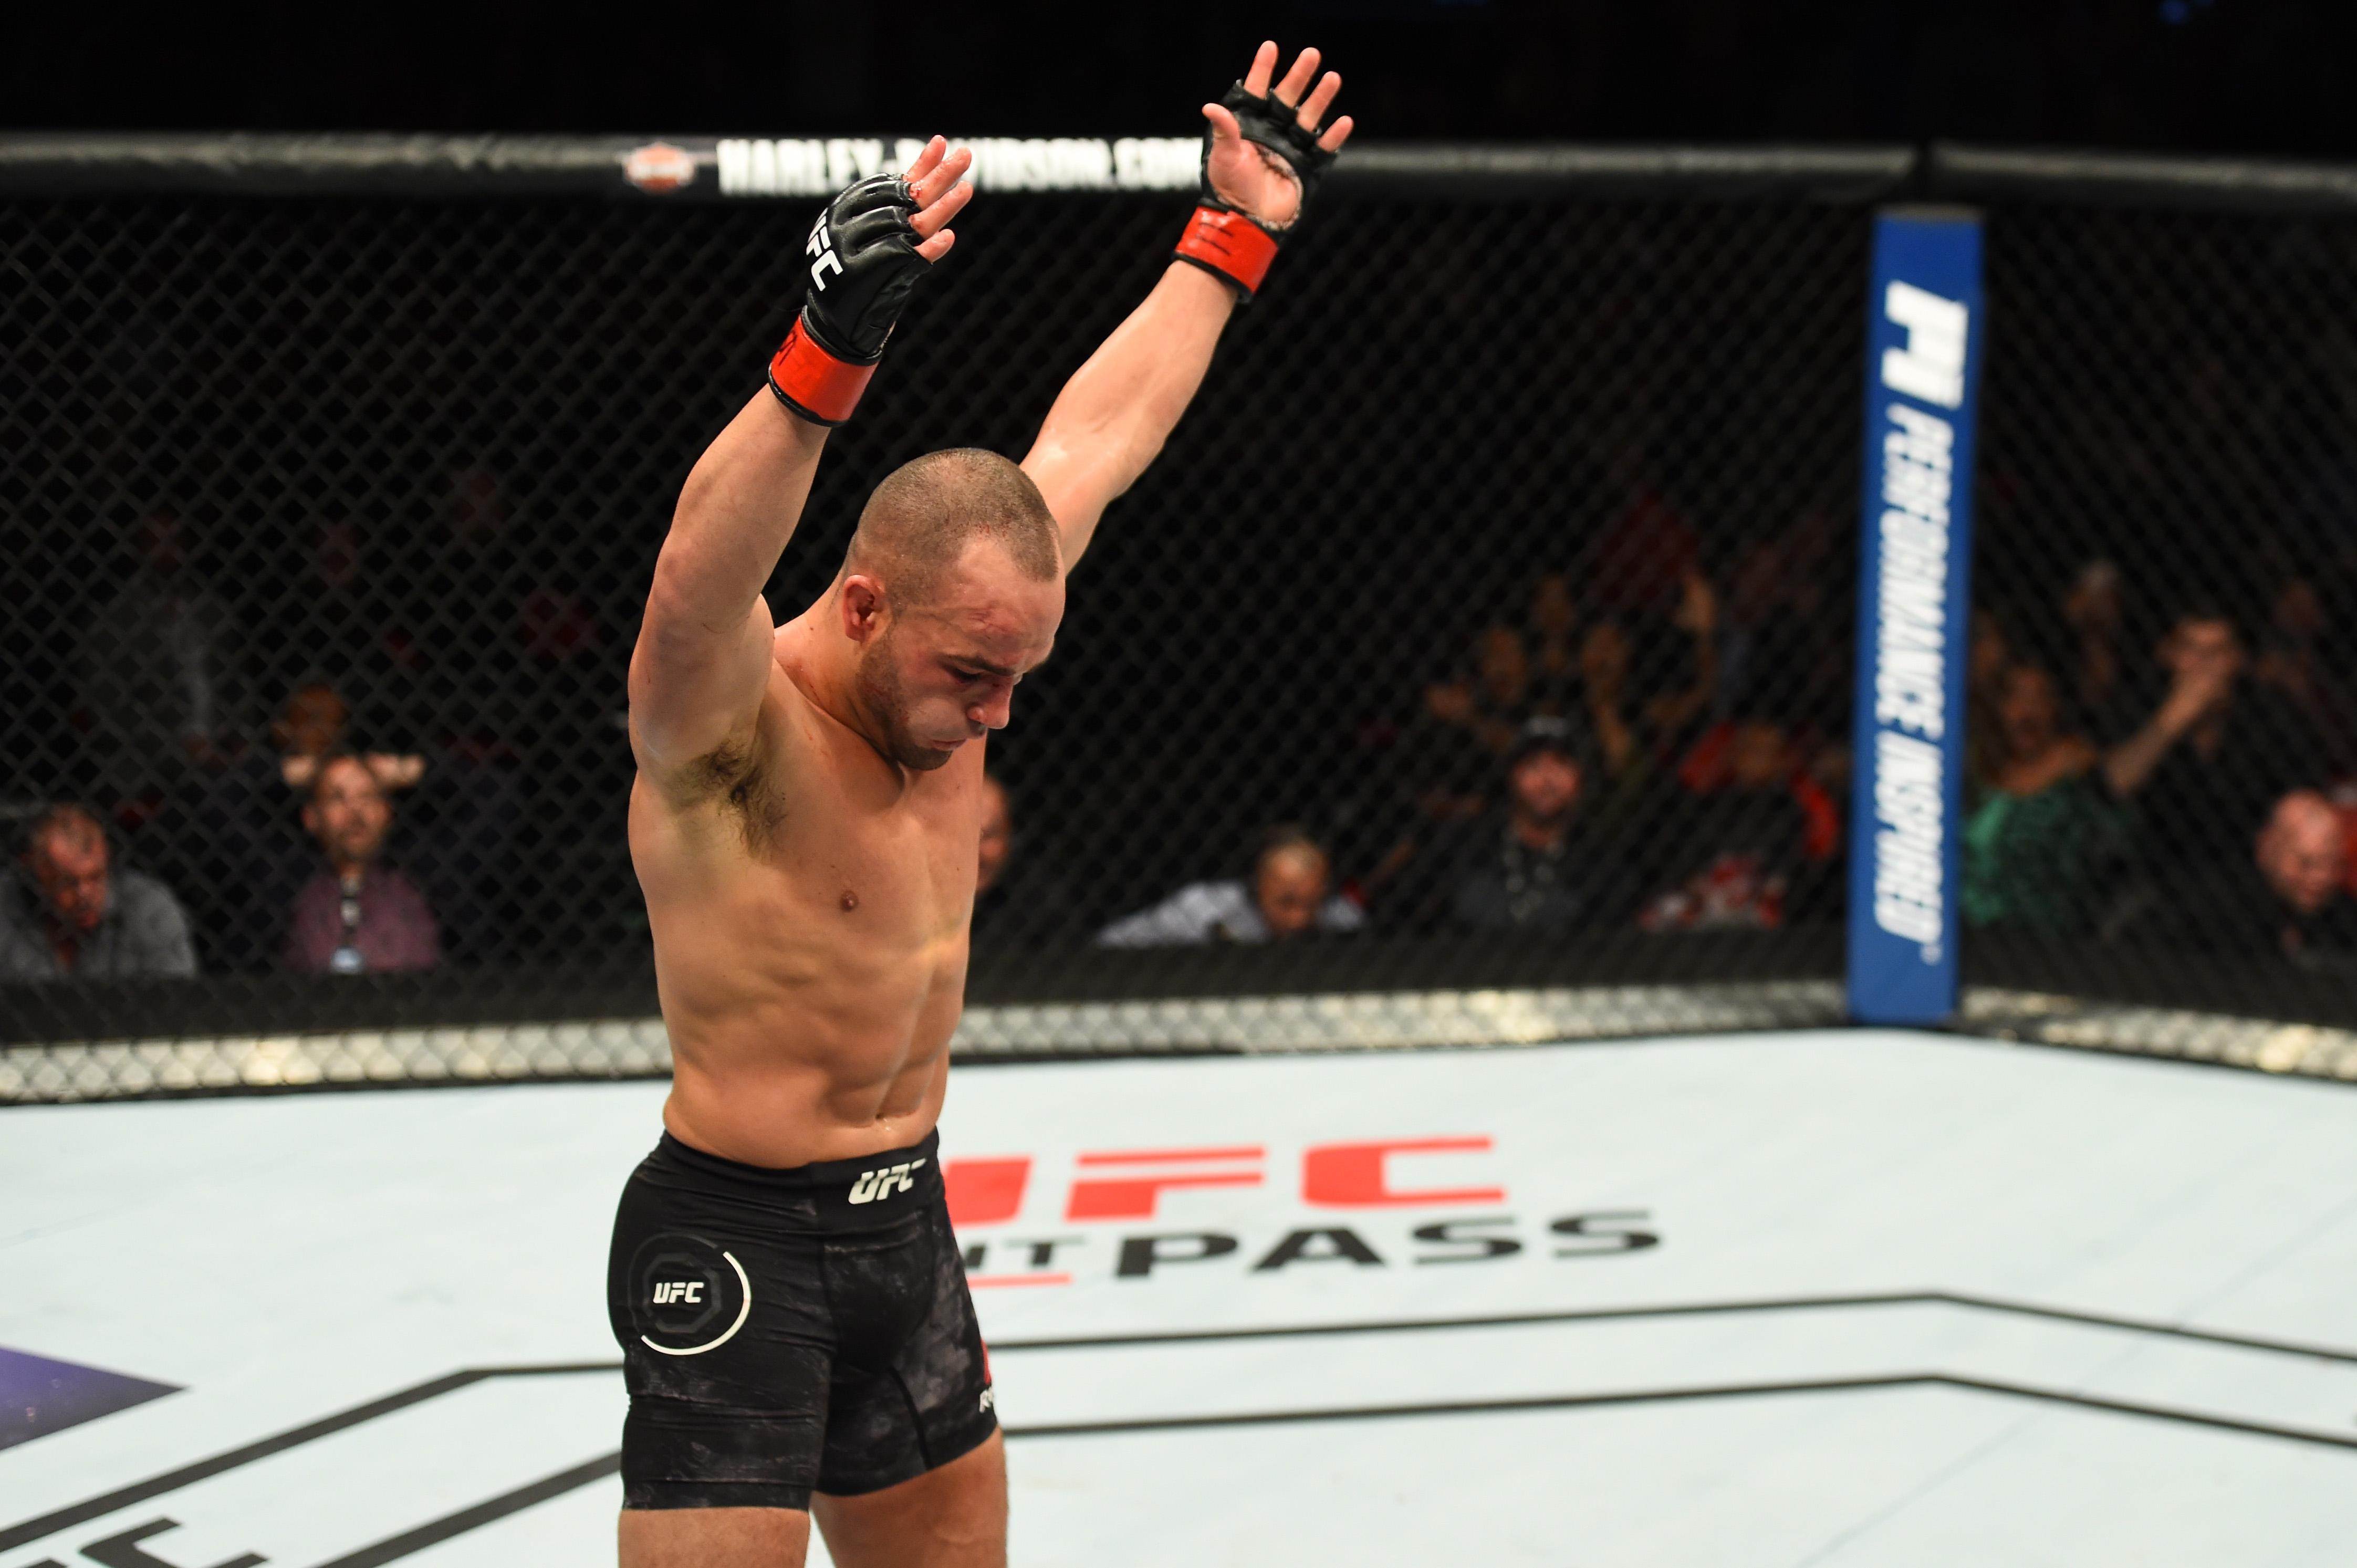 Eddie Alvarez after his fight at UFC 218.